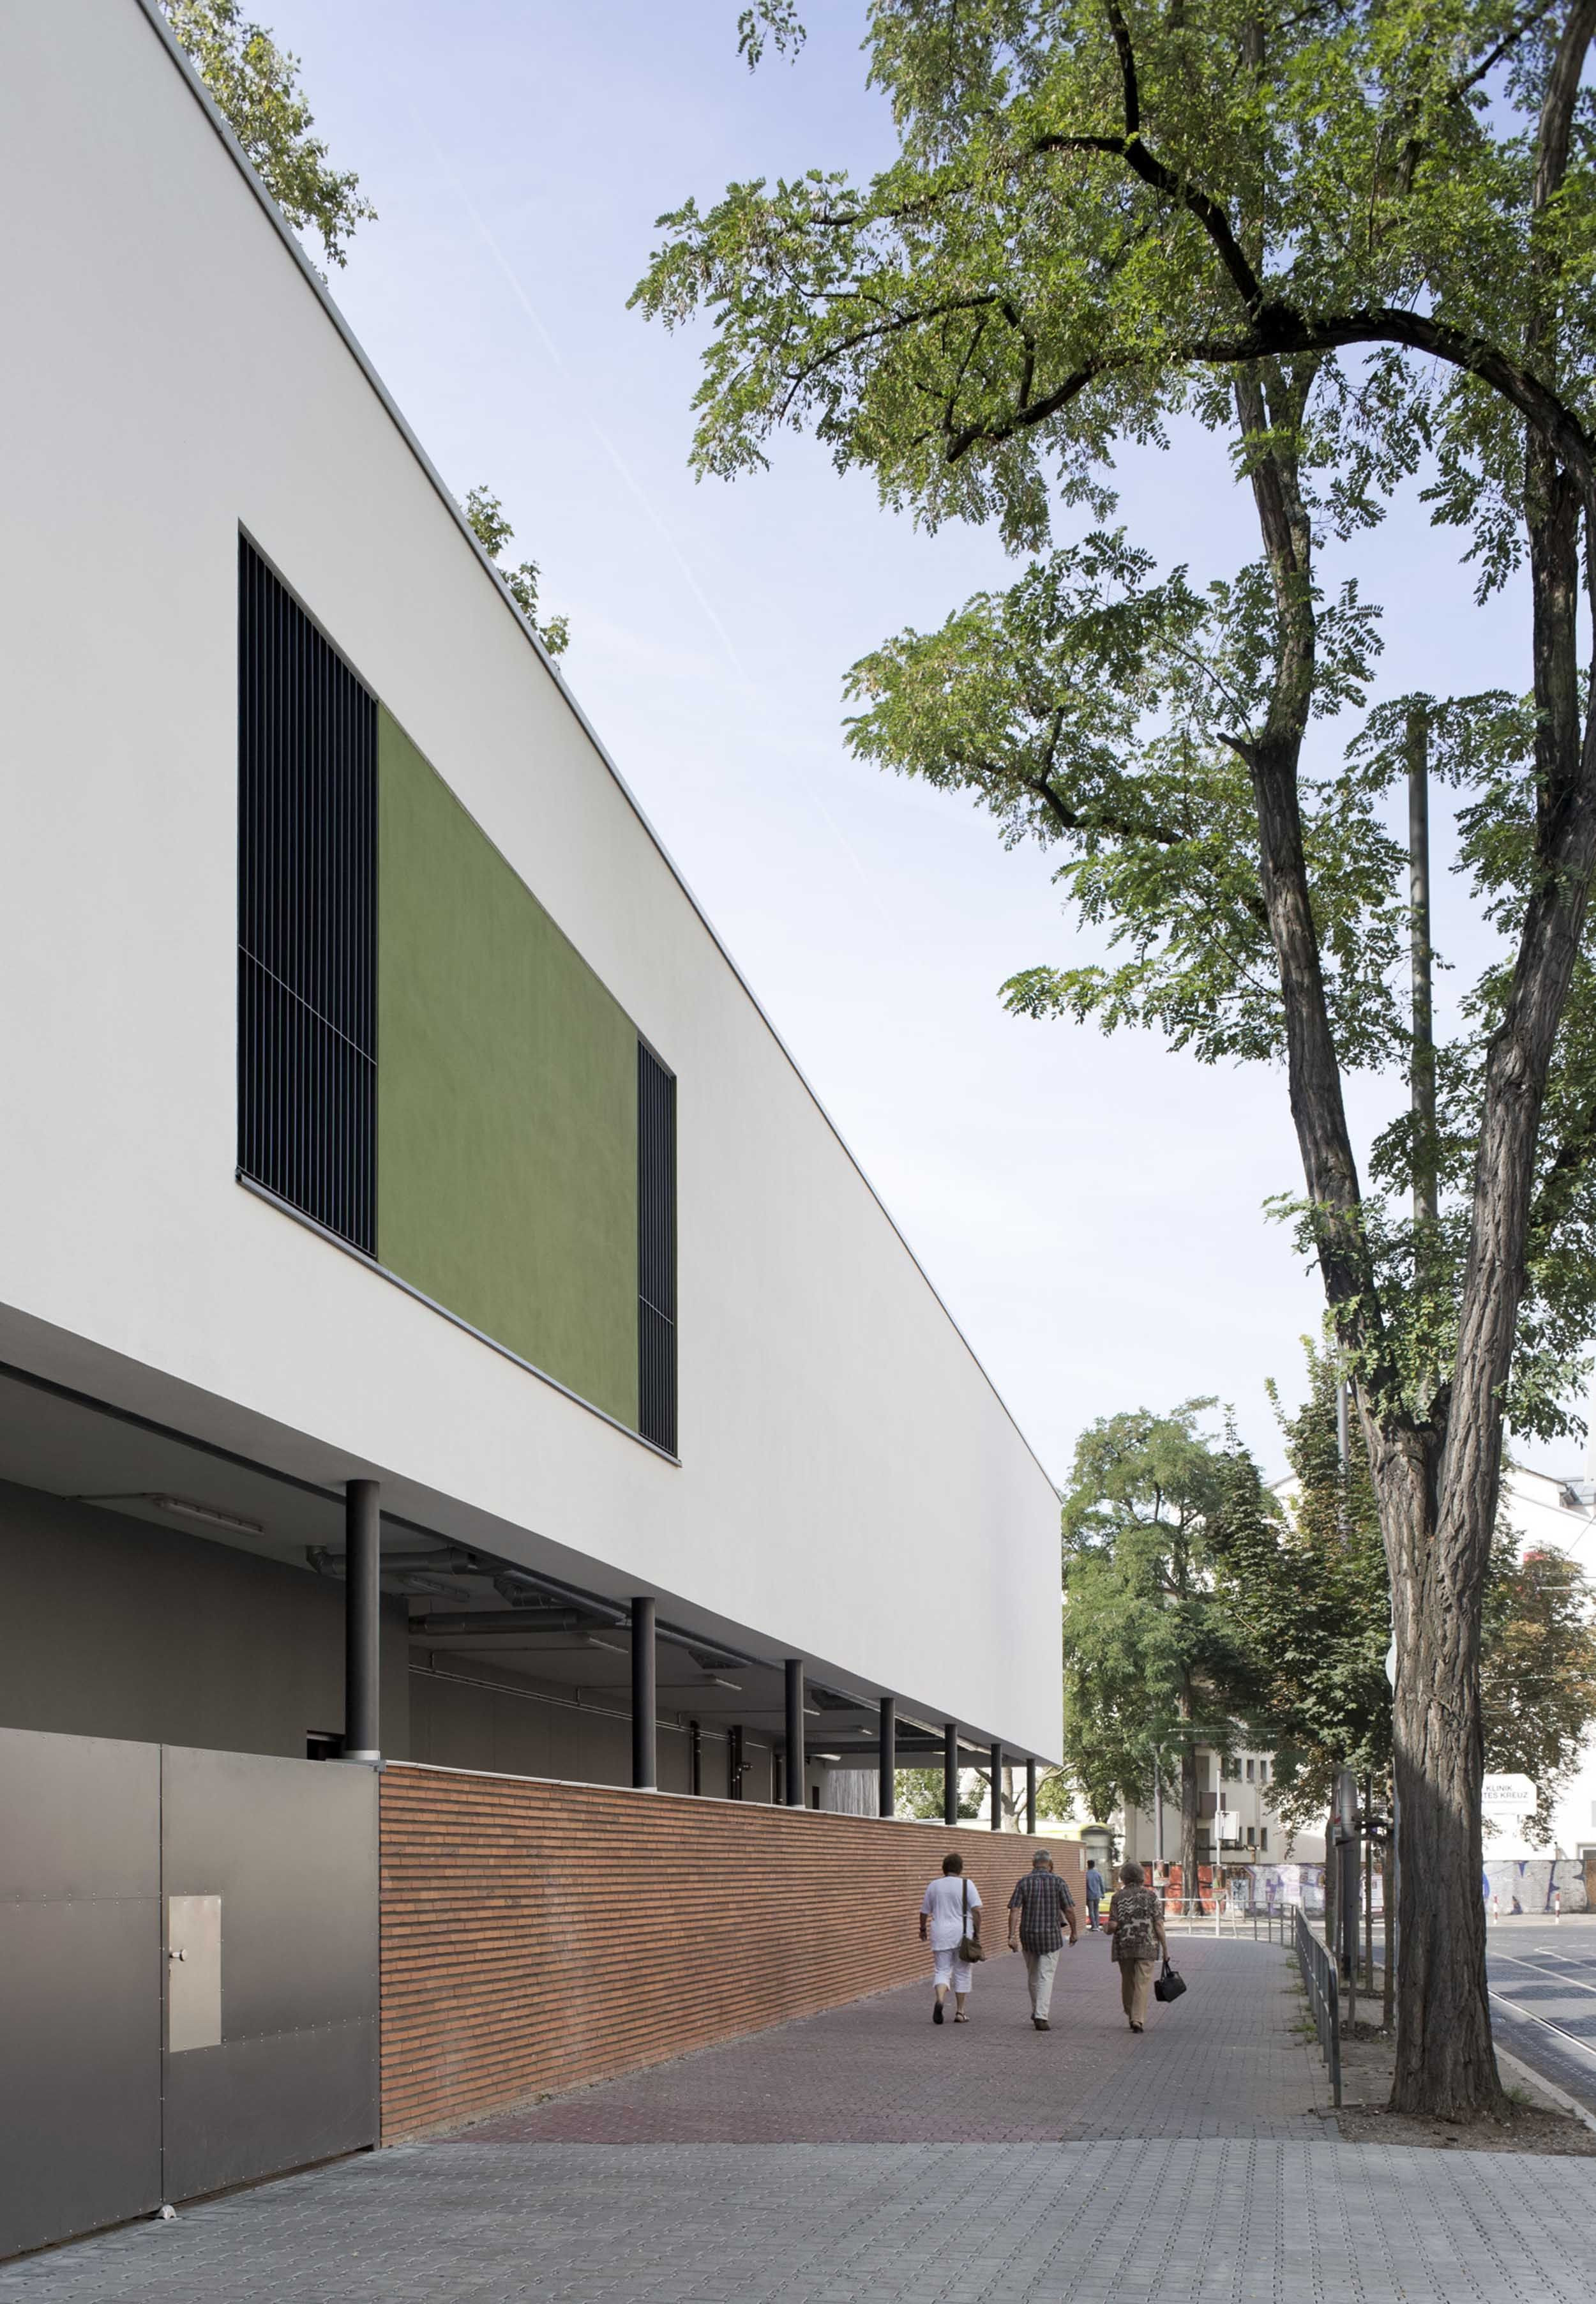 Architekten Frankfurt bärenanlage zoo frankfurt frankfurt germany by henchion reuter